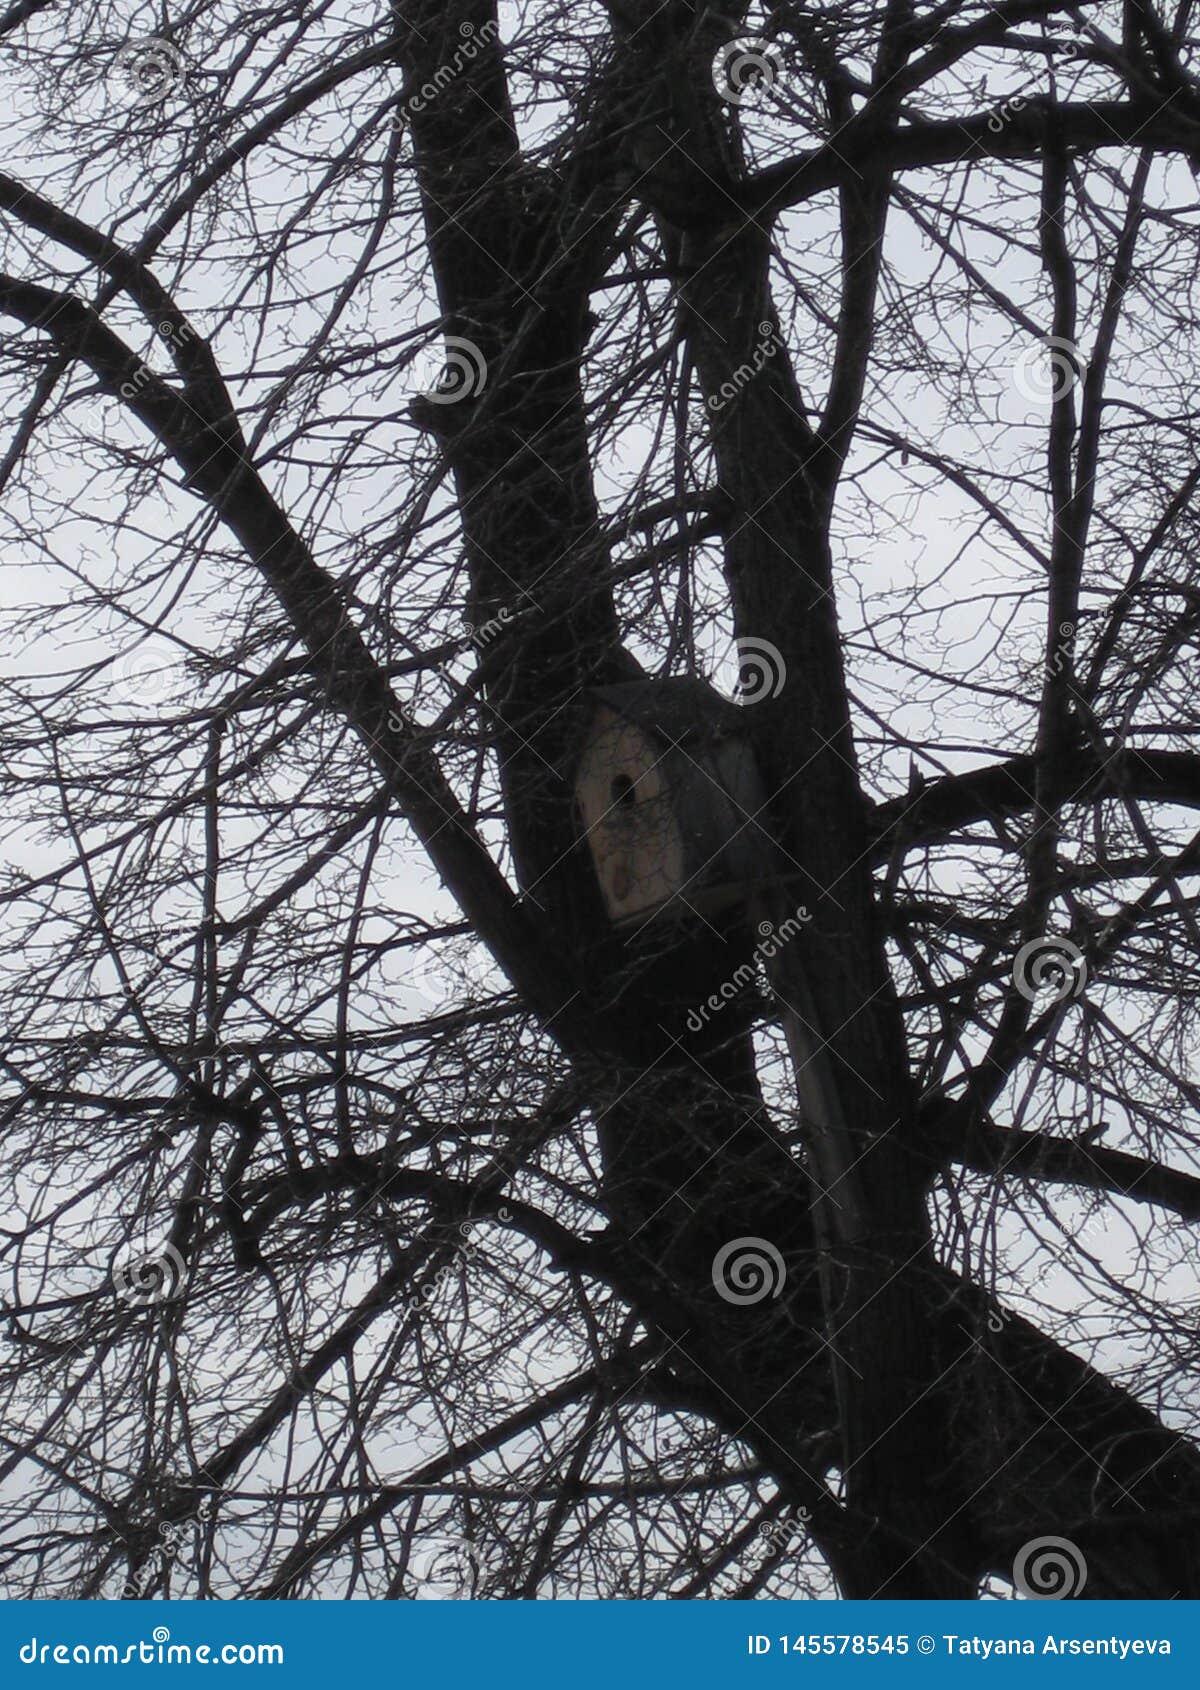 Bird house in the tree